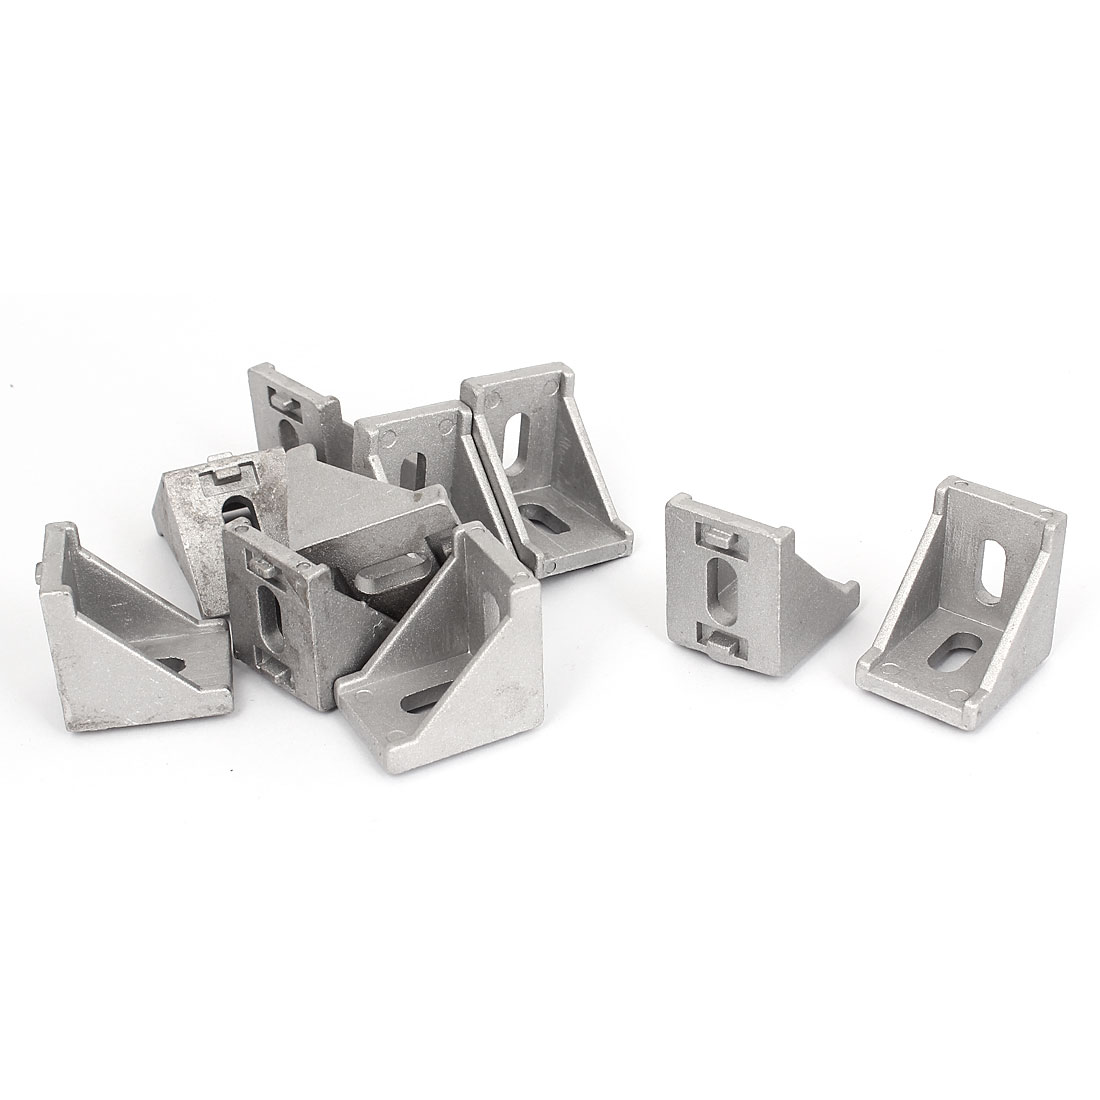 10 Pcs Silver Tone Metal L Shaped Corner Brace Angle Bracket 35mm x 35mm